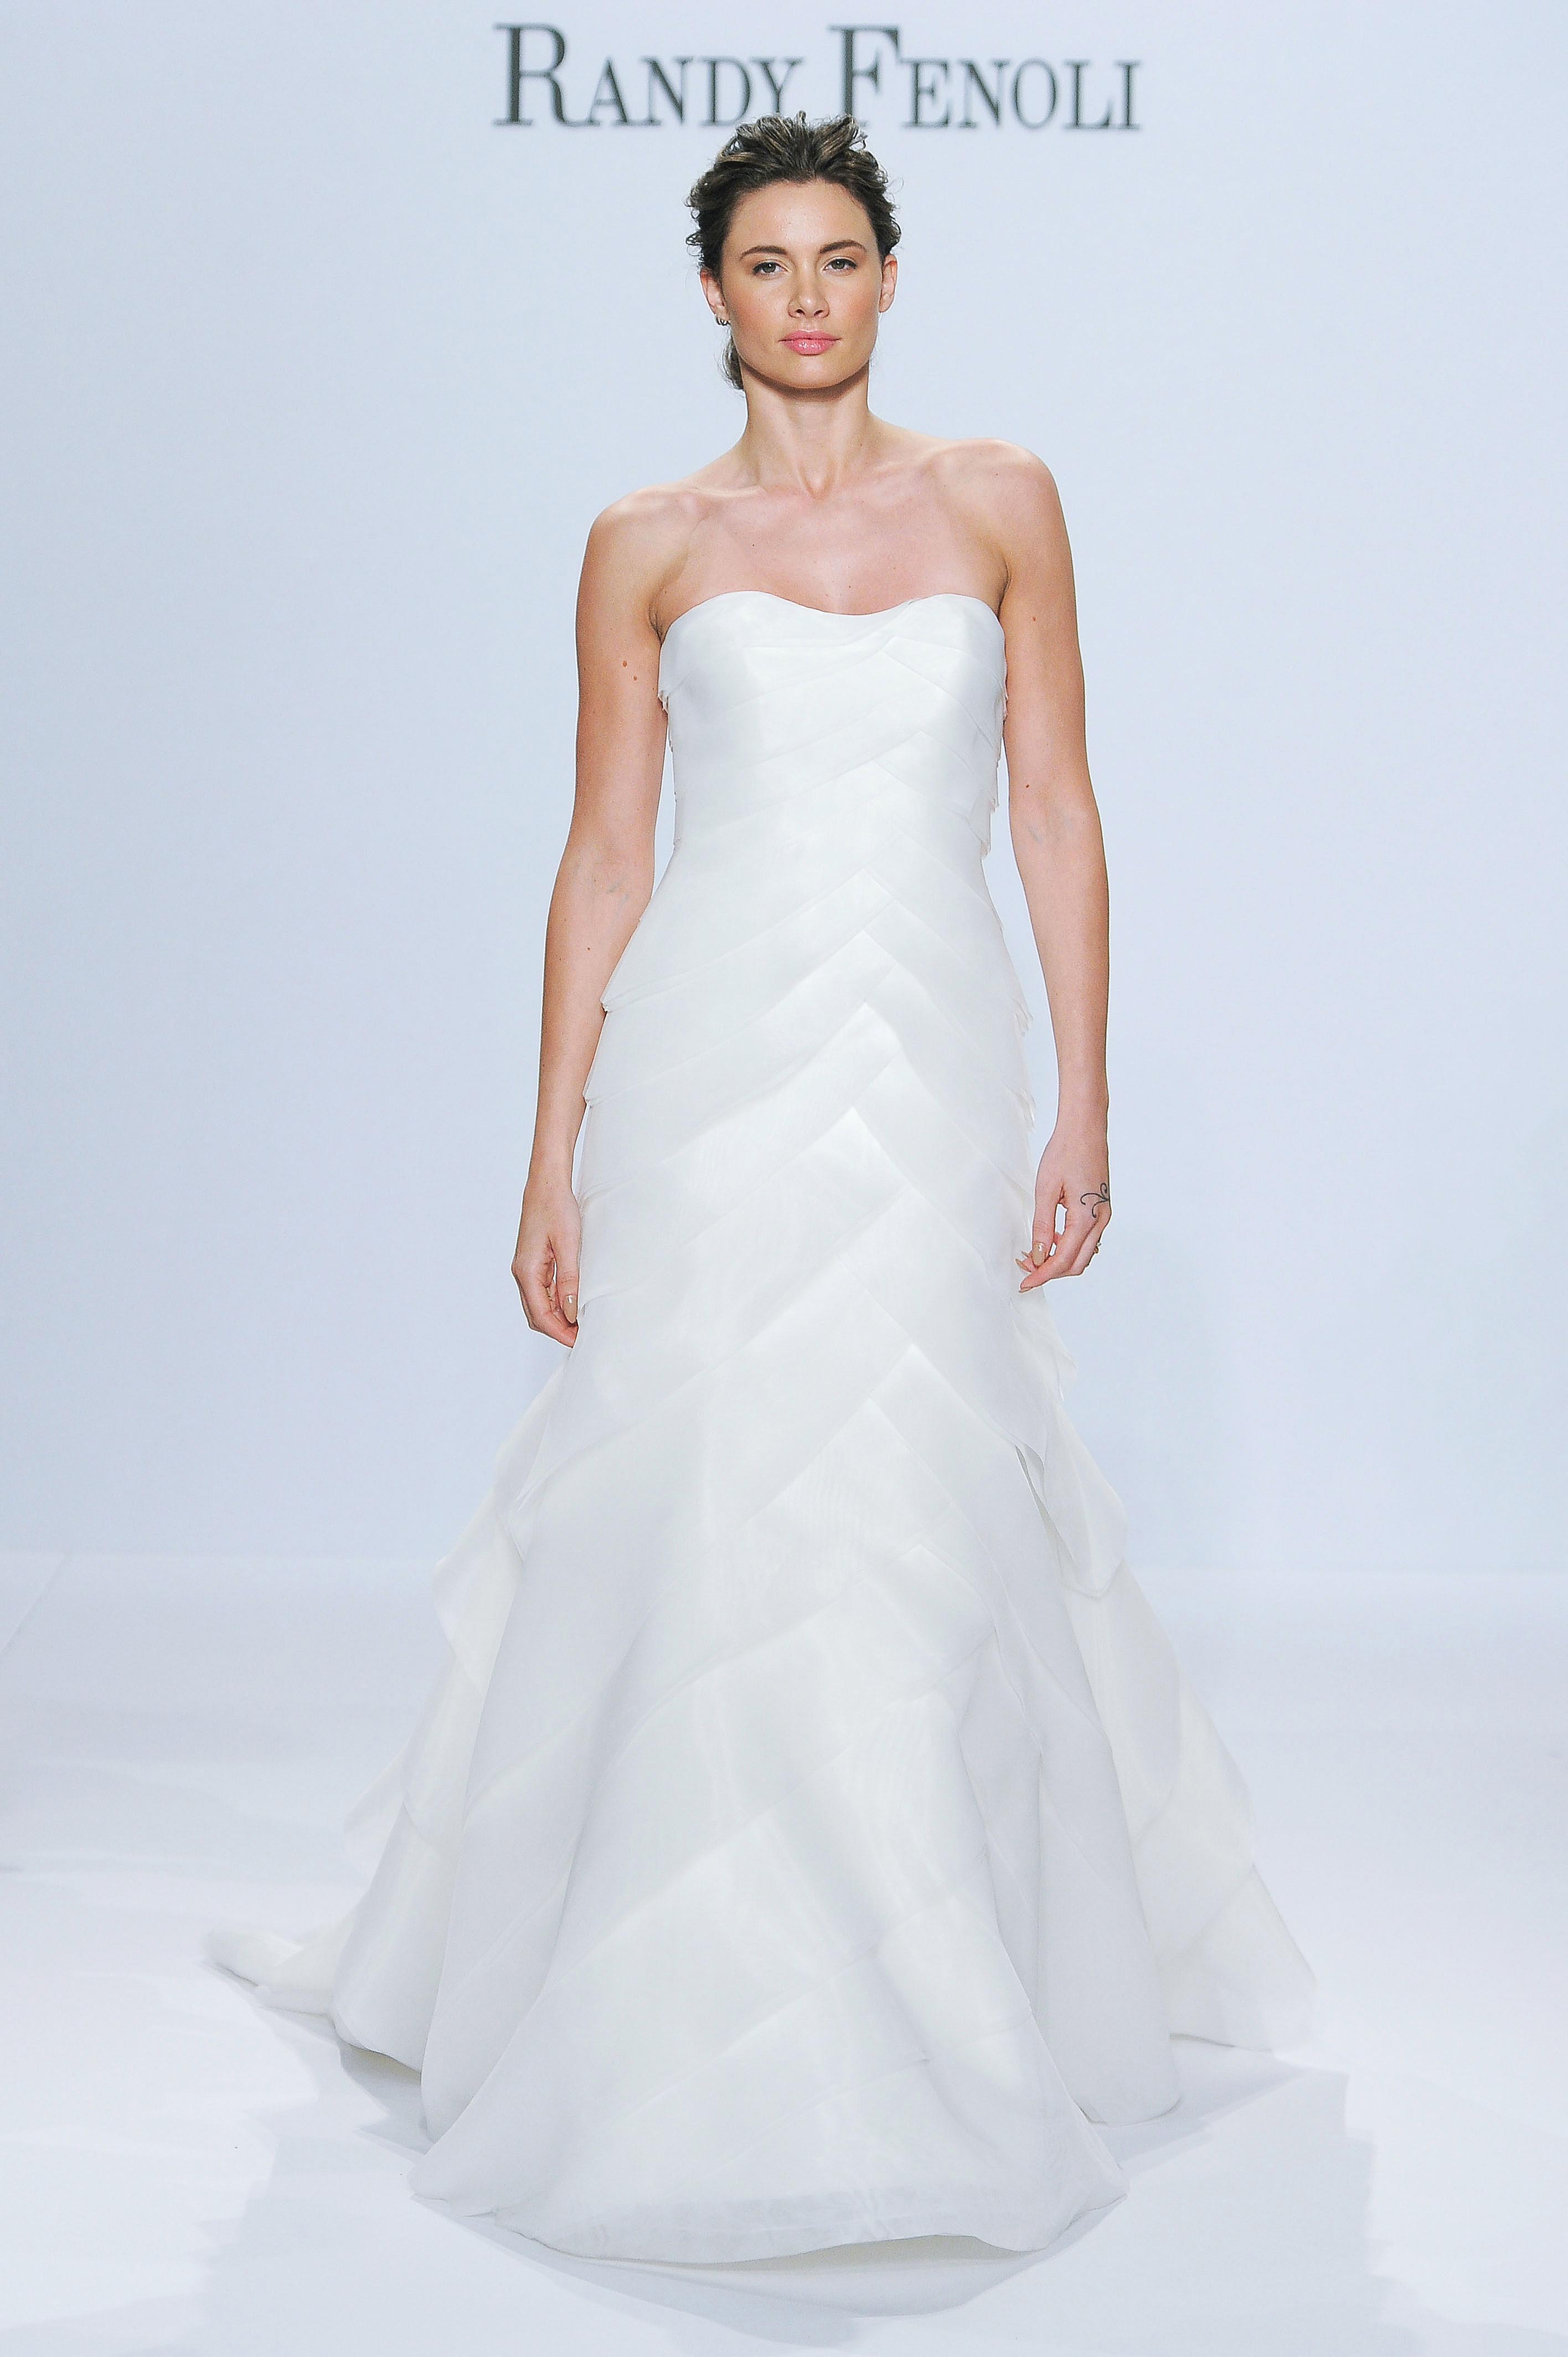 randy fenoli sleeveless wedding dress spring 2018